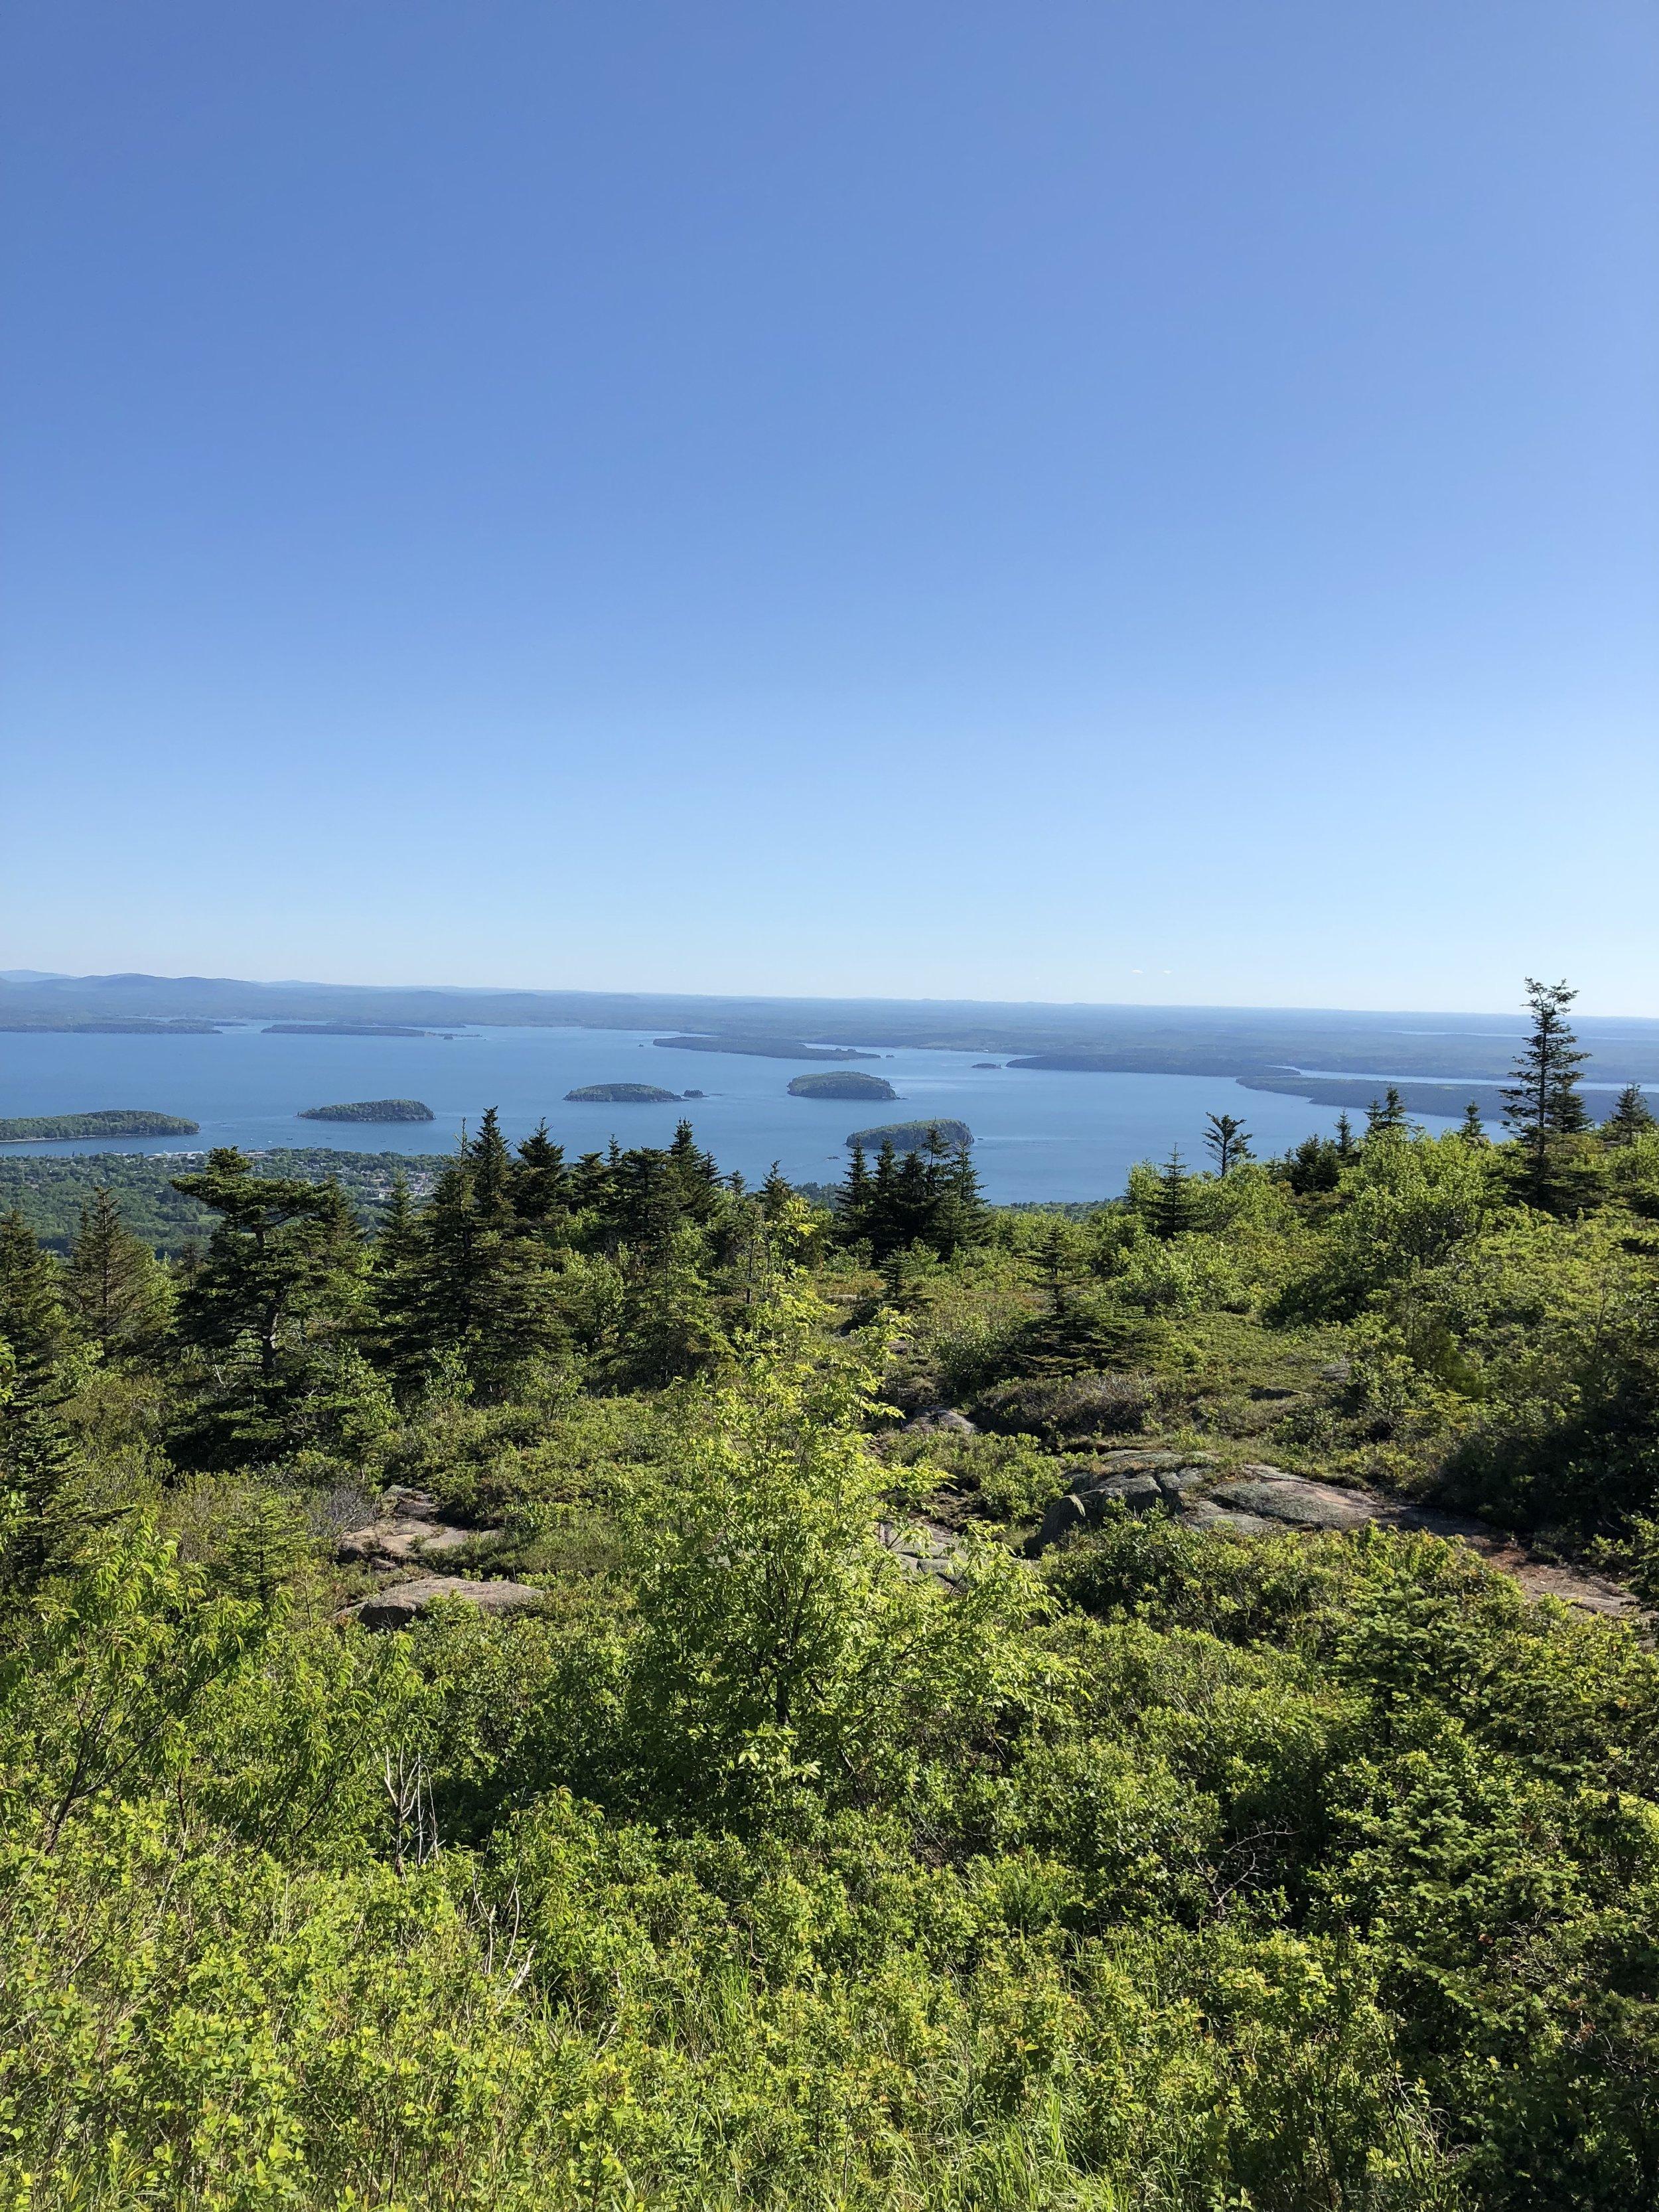 View from Cadillac Mountain at Acadia